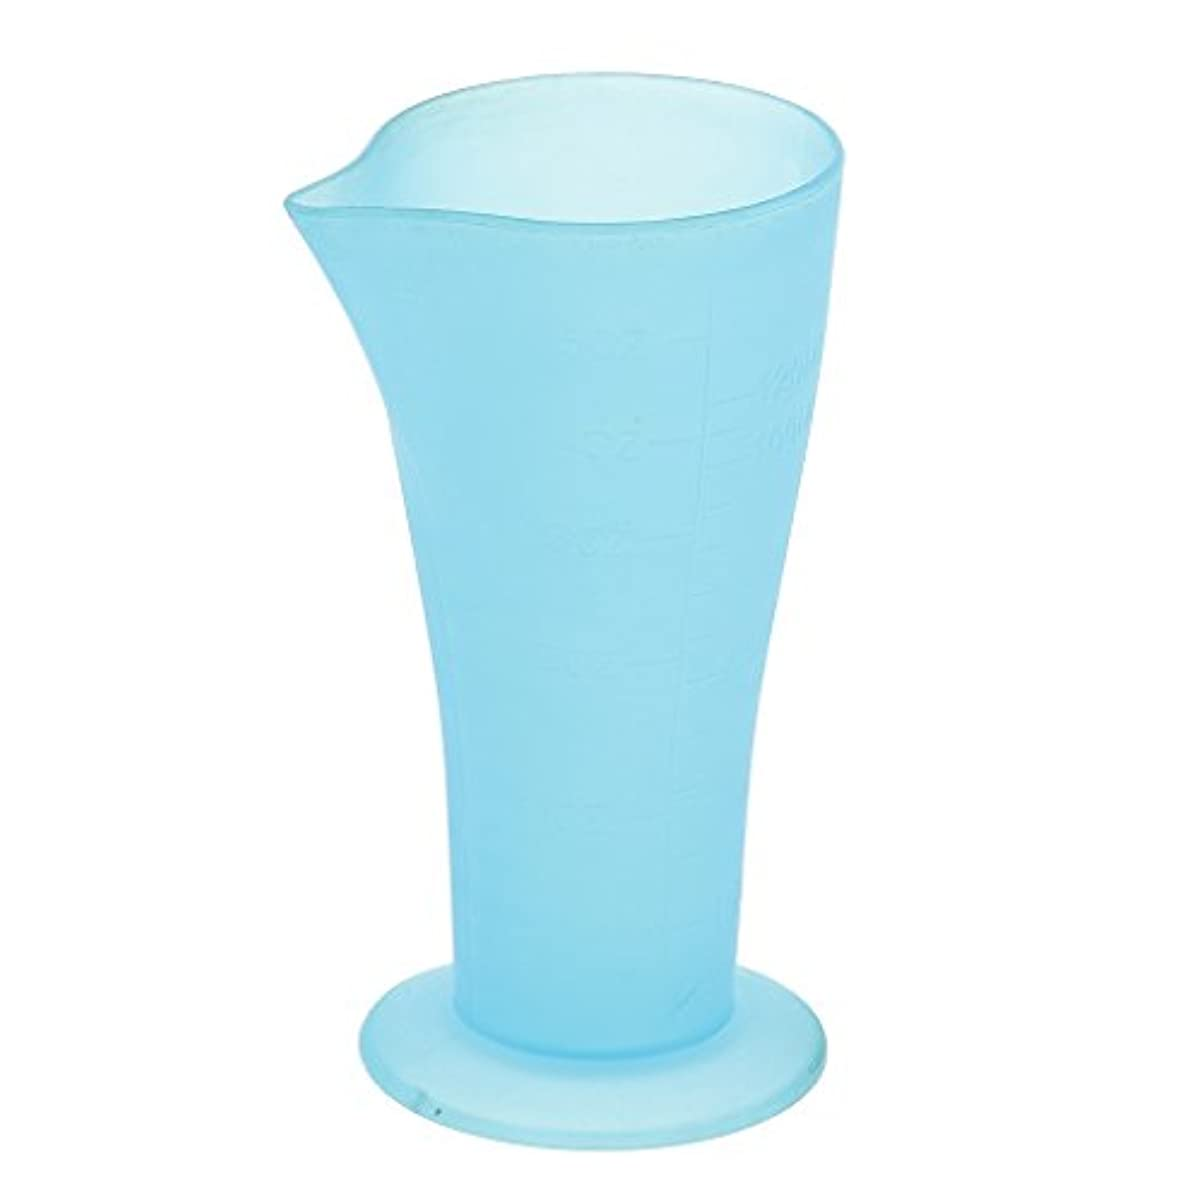 Baosity 計量カップ ヘアダイカップ プラスチック サロン 髪の色合い 色の混合用 読みやすい測定 再使用可能